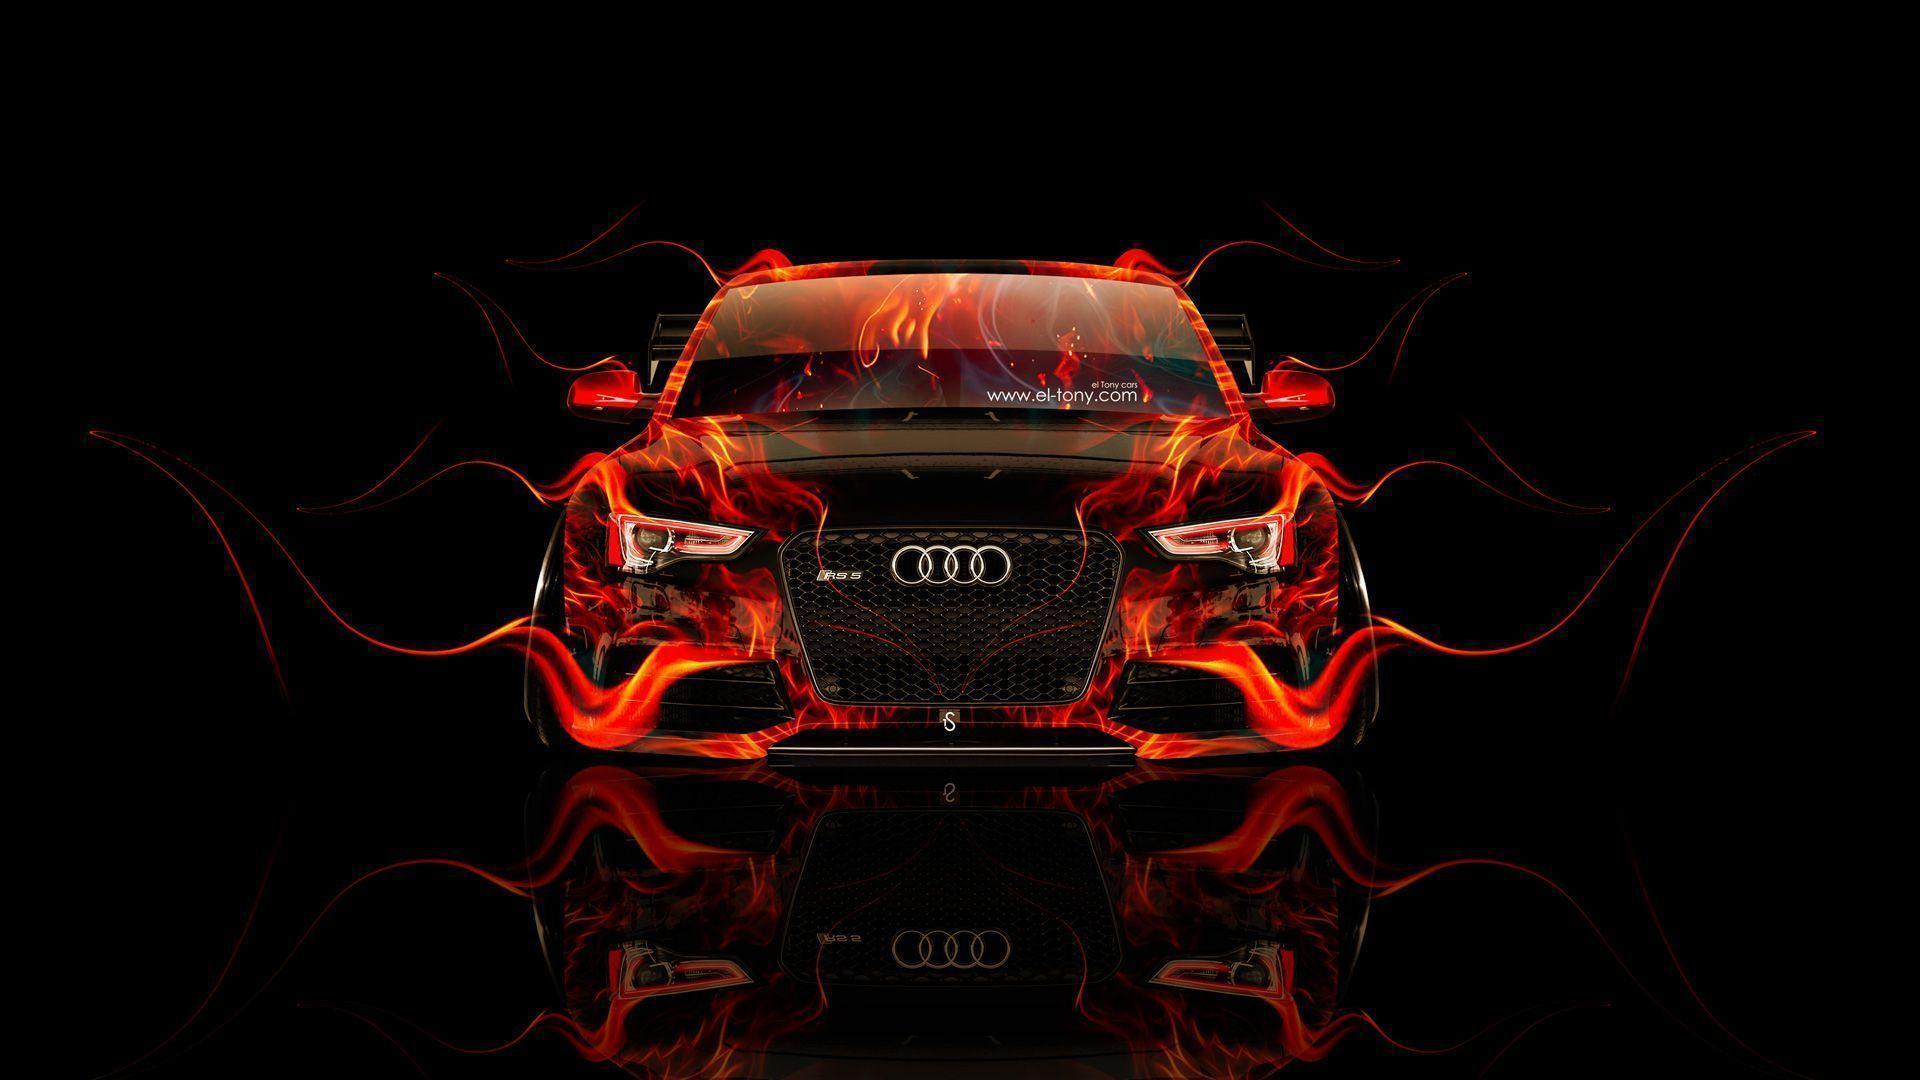 Audi Rs5 Wallpapers Wallpaper Cave